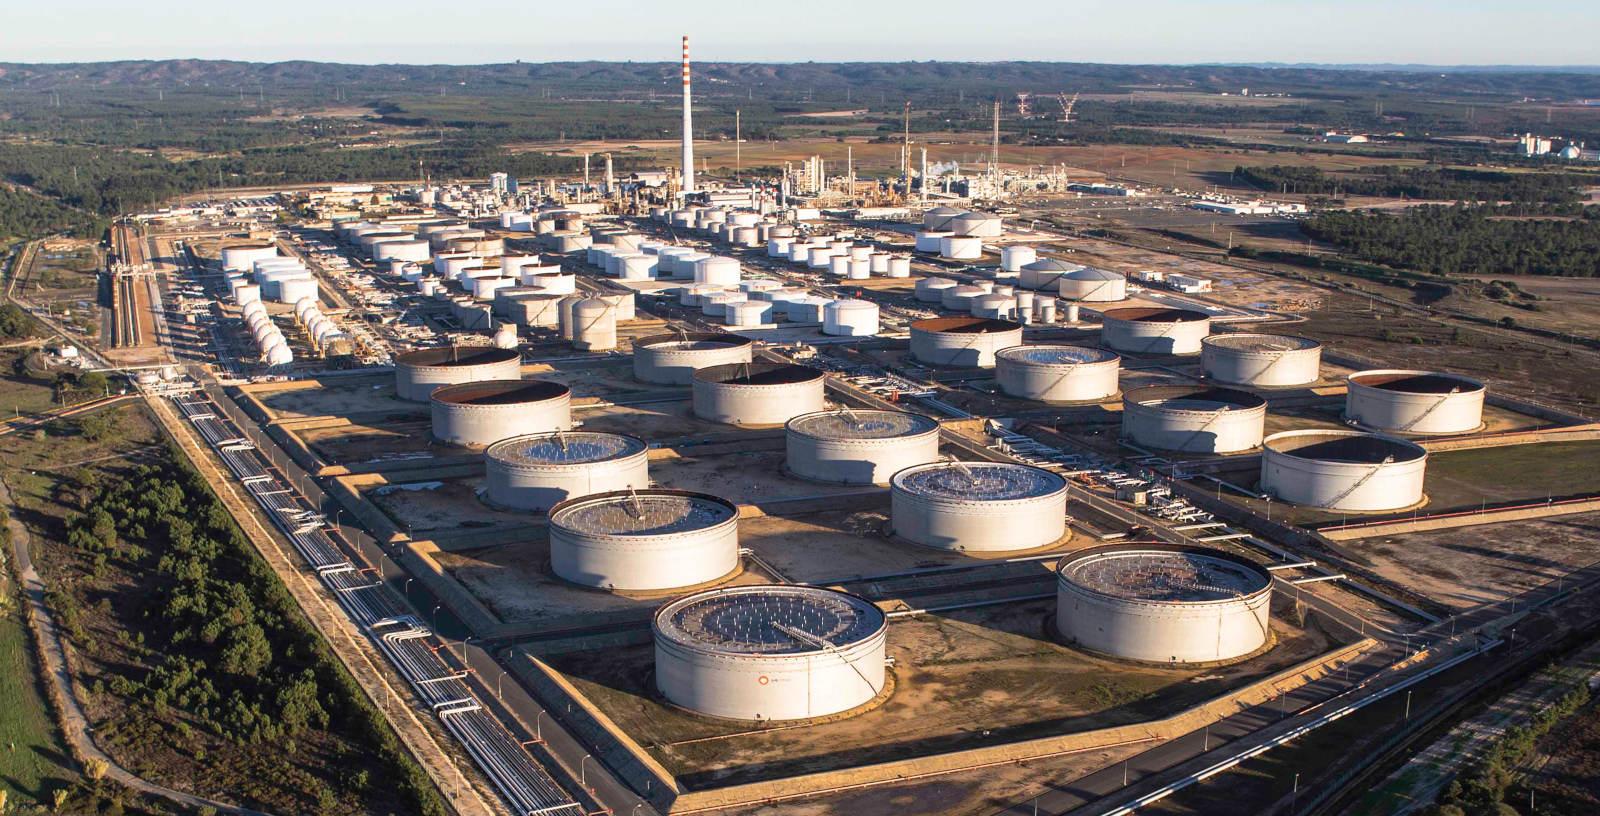 Revamp_VGO_Hydrotreating_Mild_Hydrocracker_Sines_Refinery_Portugal_GALP_IDOM_01